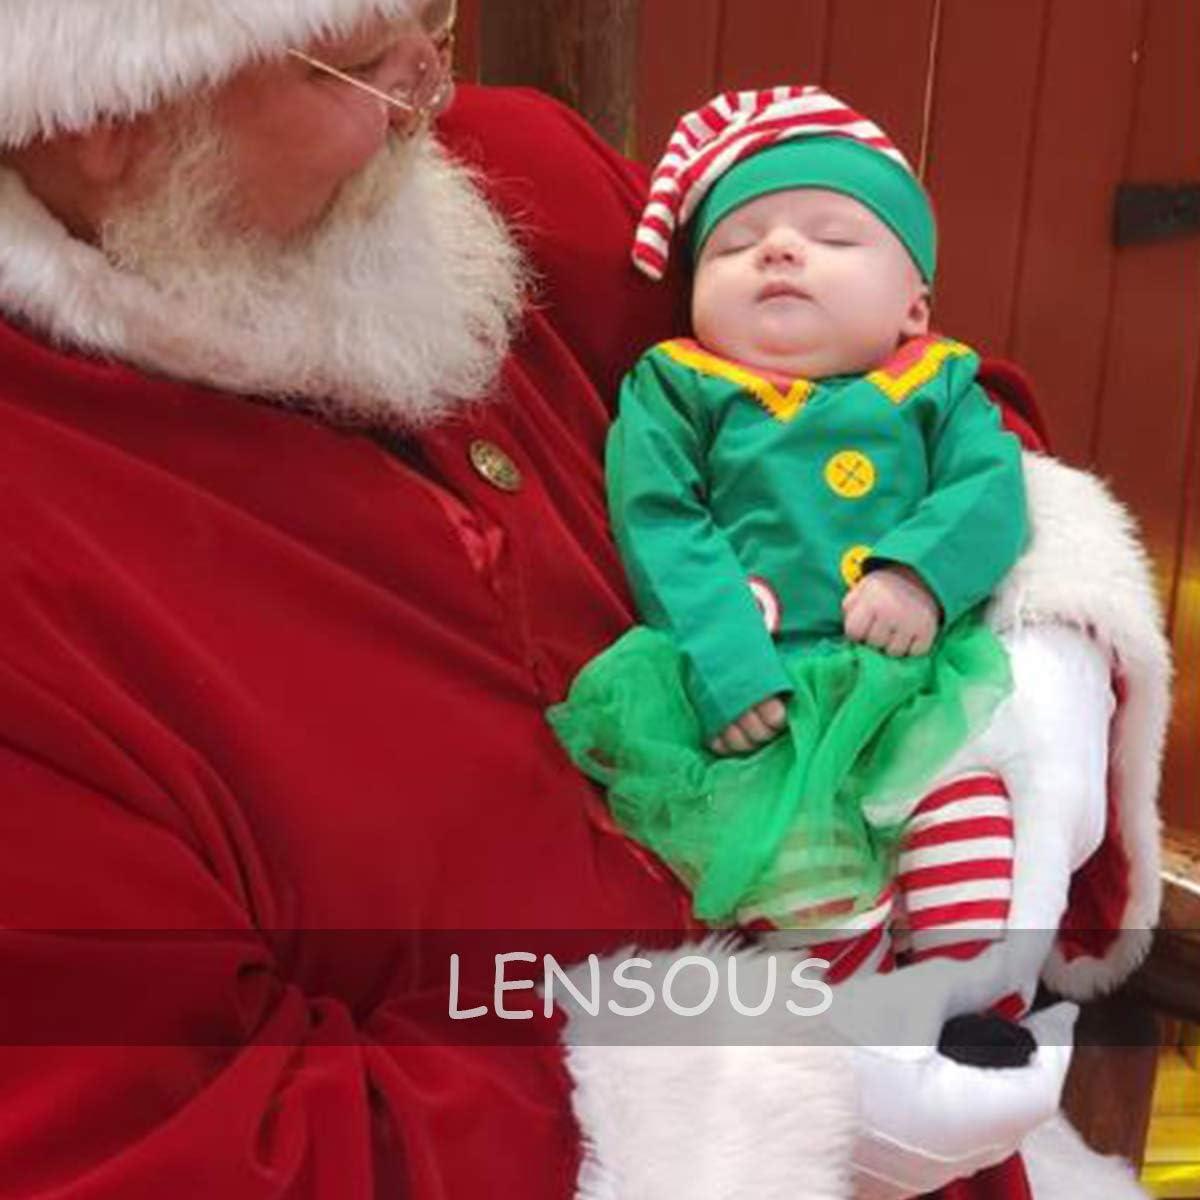 Baby Girls Newborn 1st Christmas Costume Tutu Dress Santa Claus Outfit Set